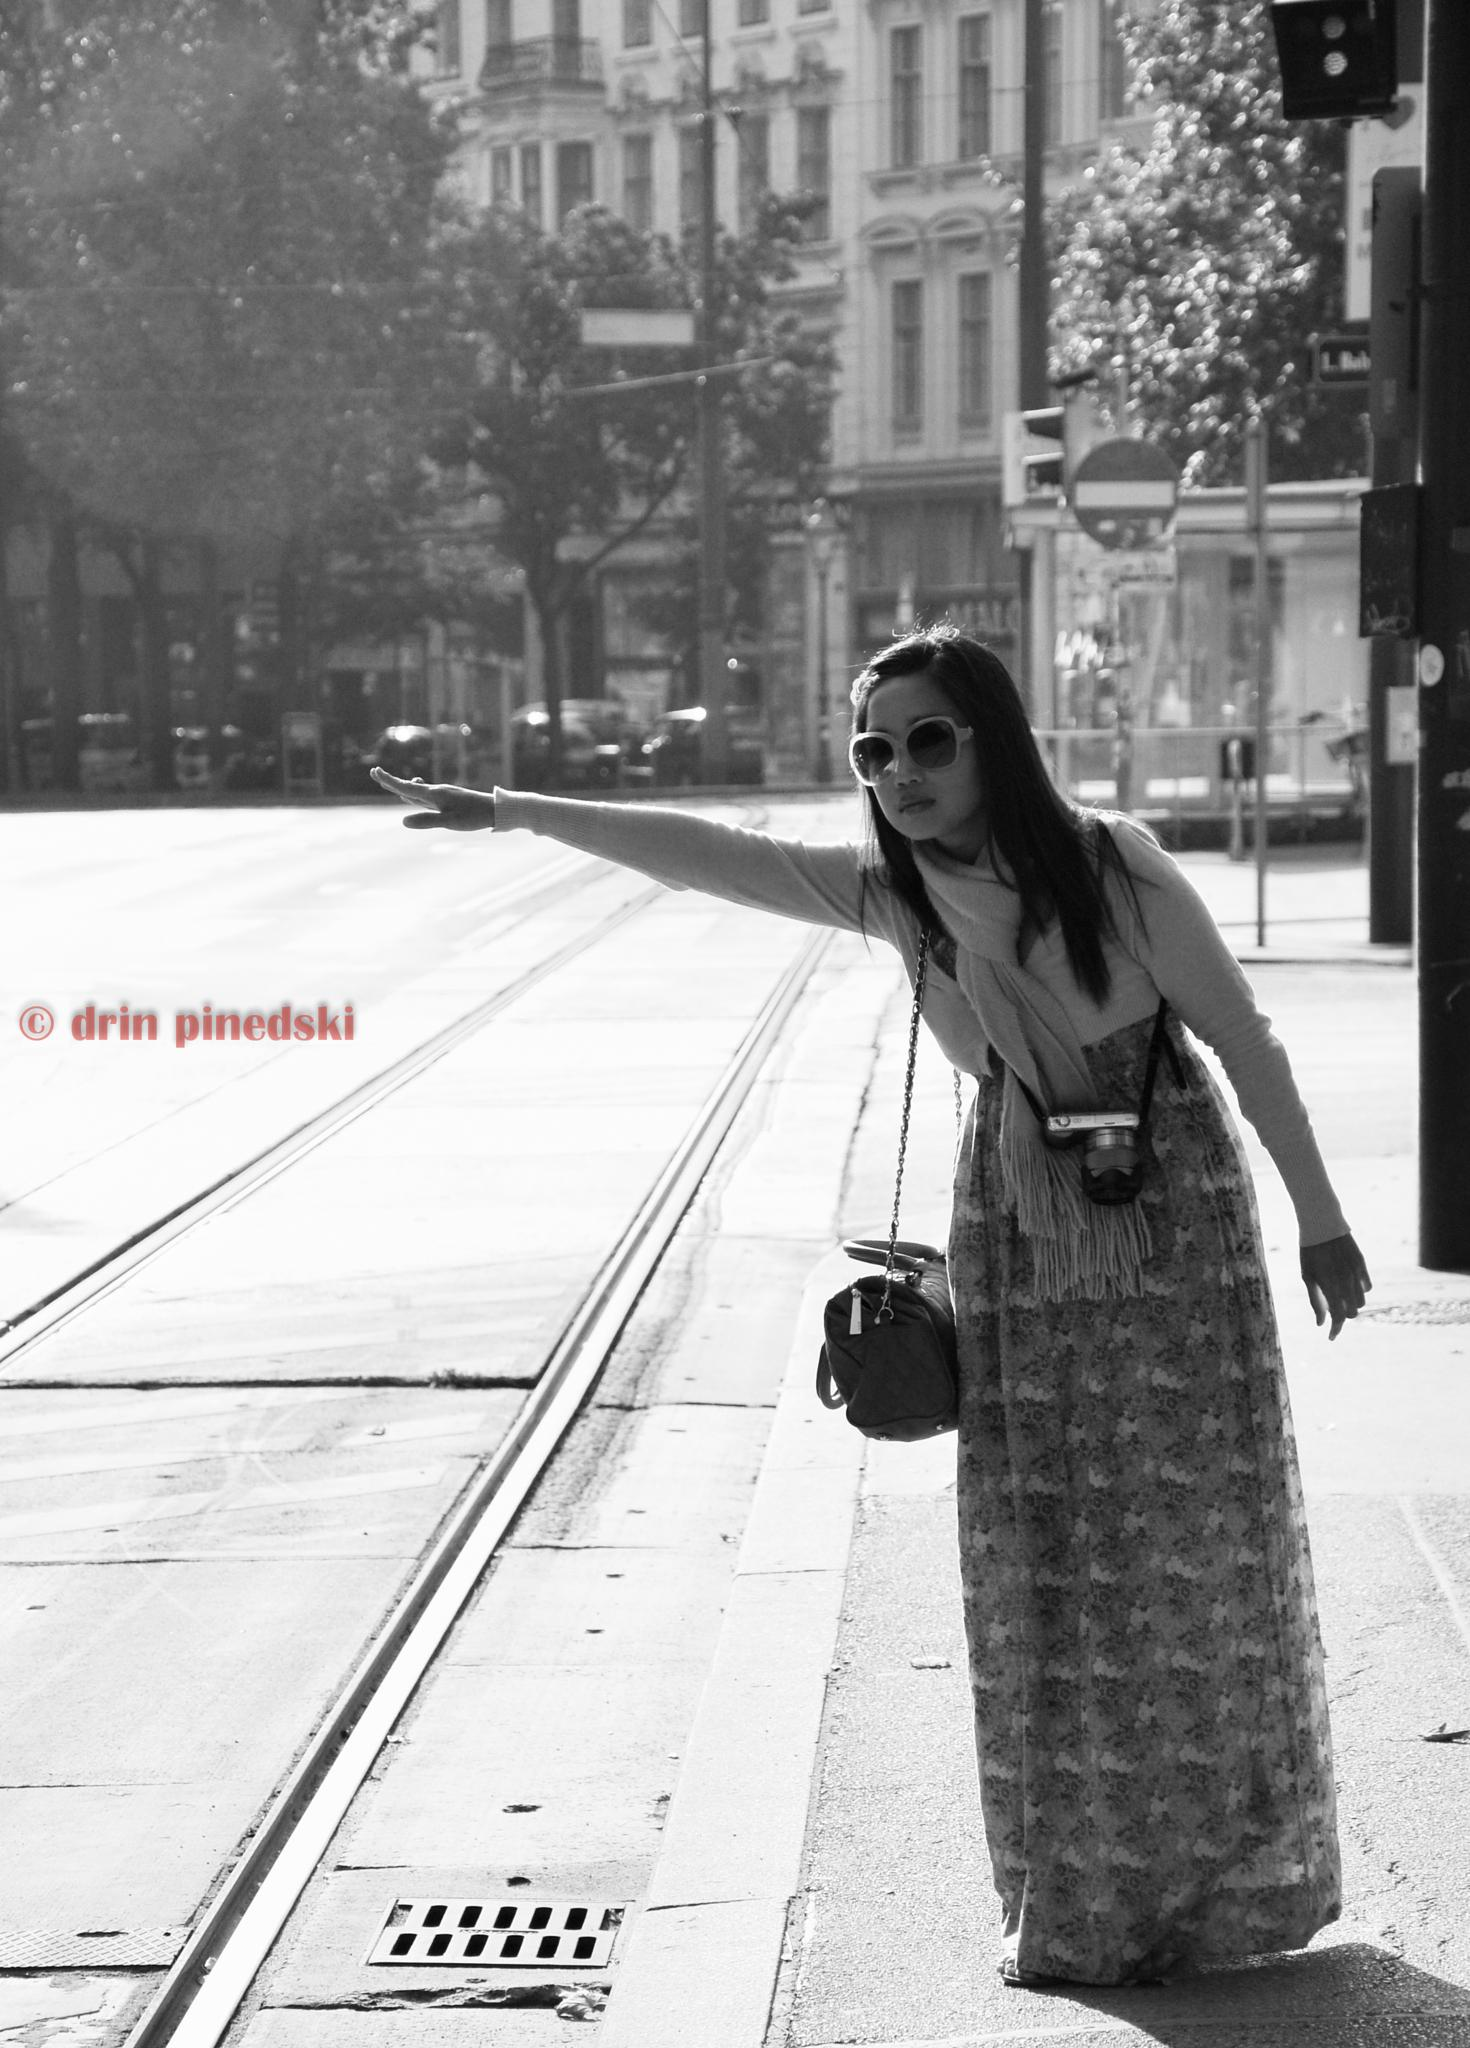 Tram Stop? by Drin Pinedski